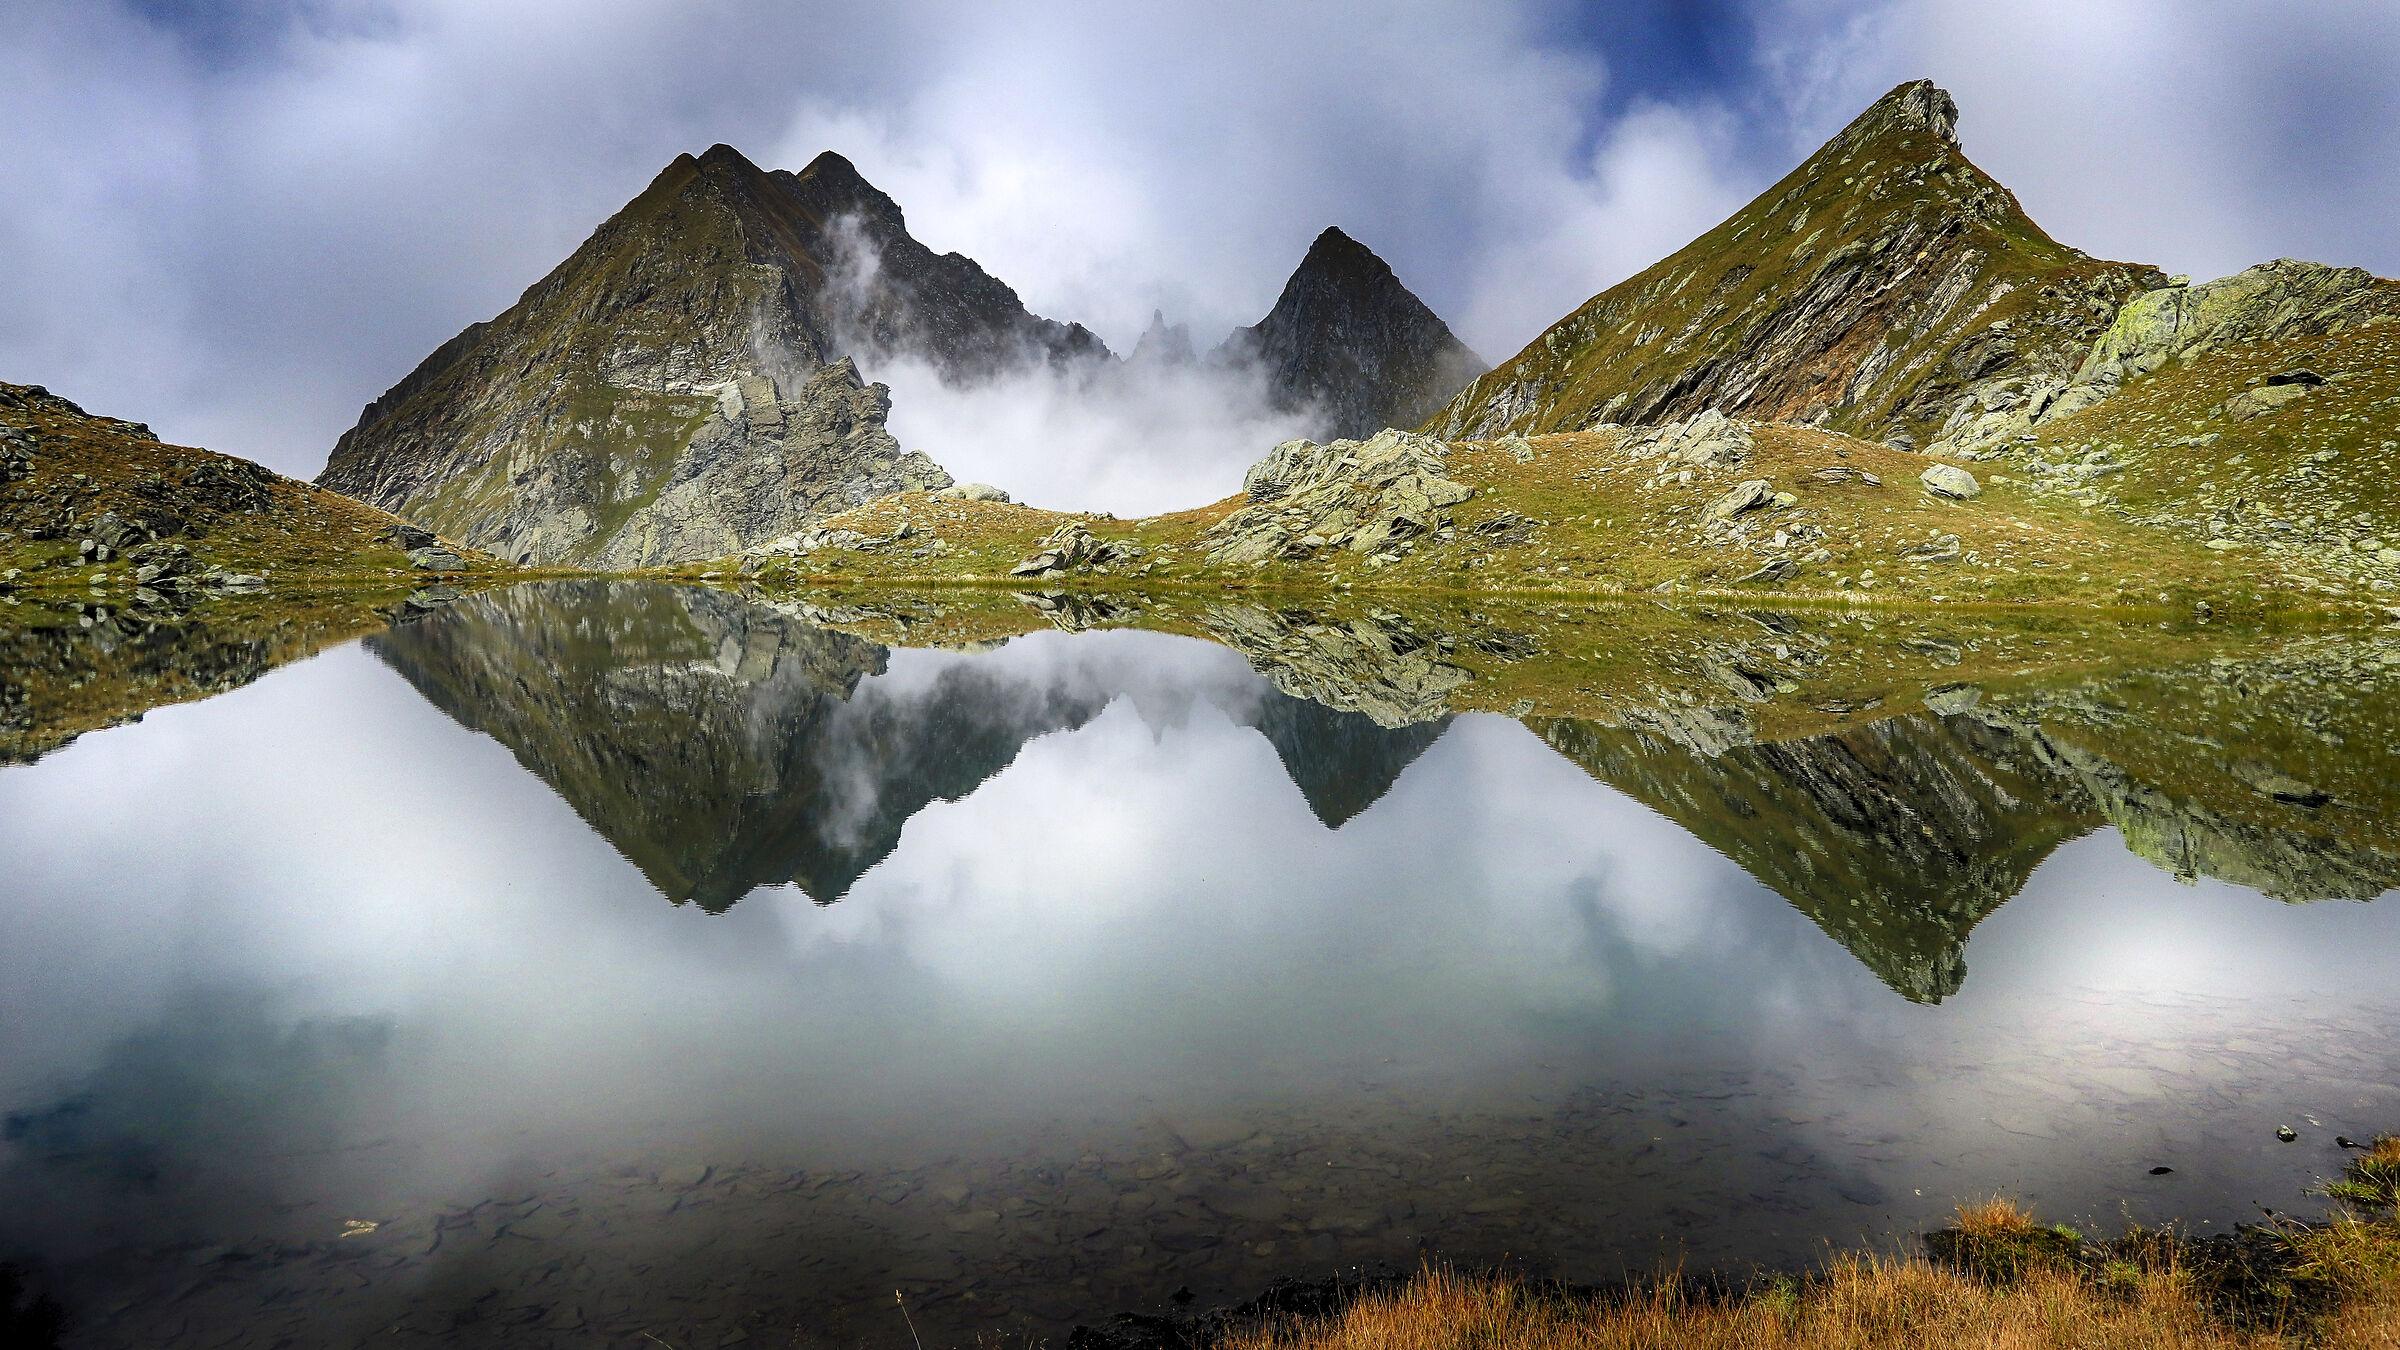 Lower Lake of Pyanei m.2330 - Antrona Valley...